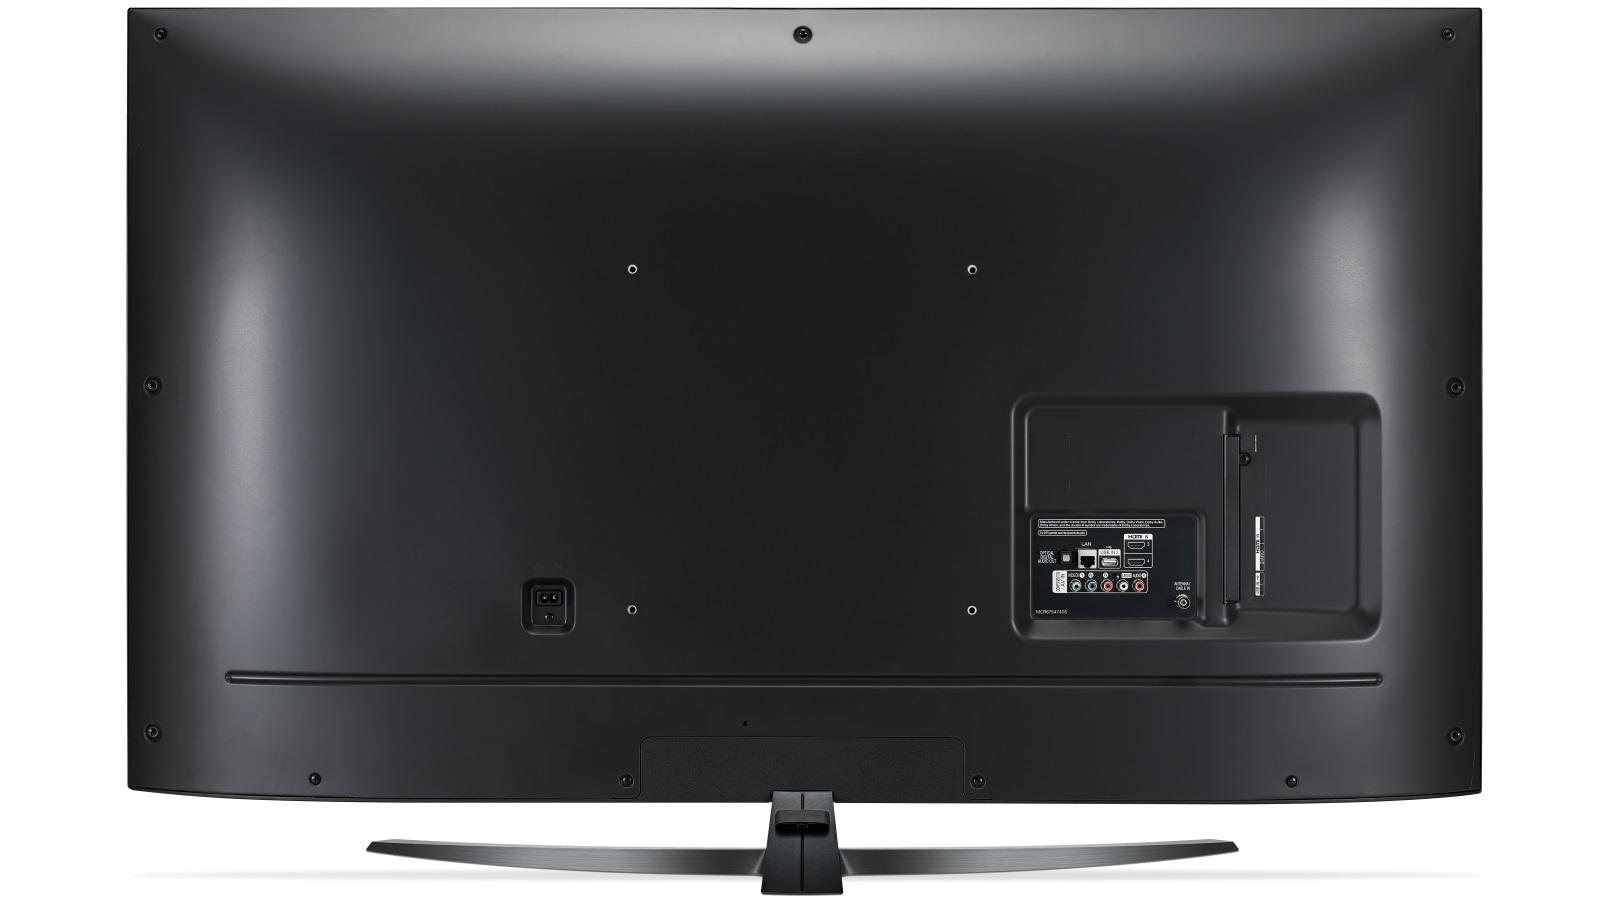 LG 65-inch UM76 4K UHD LED LCD AI ThinQ Smart TV